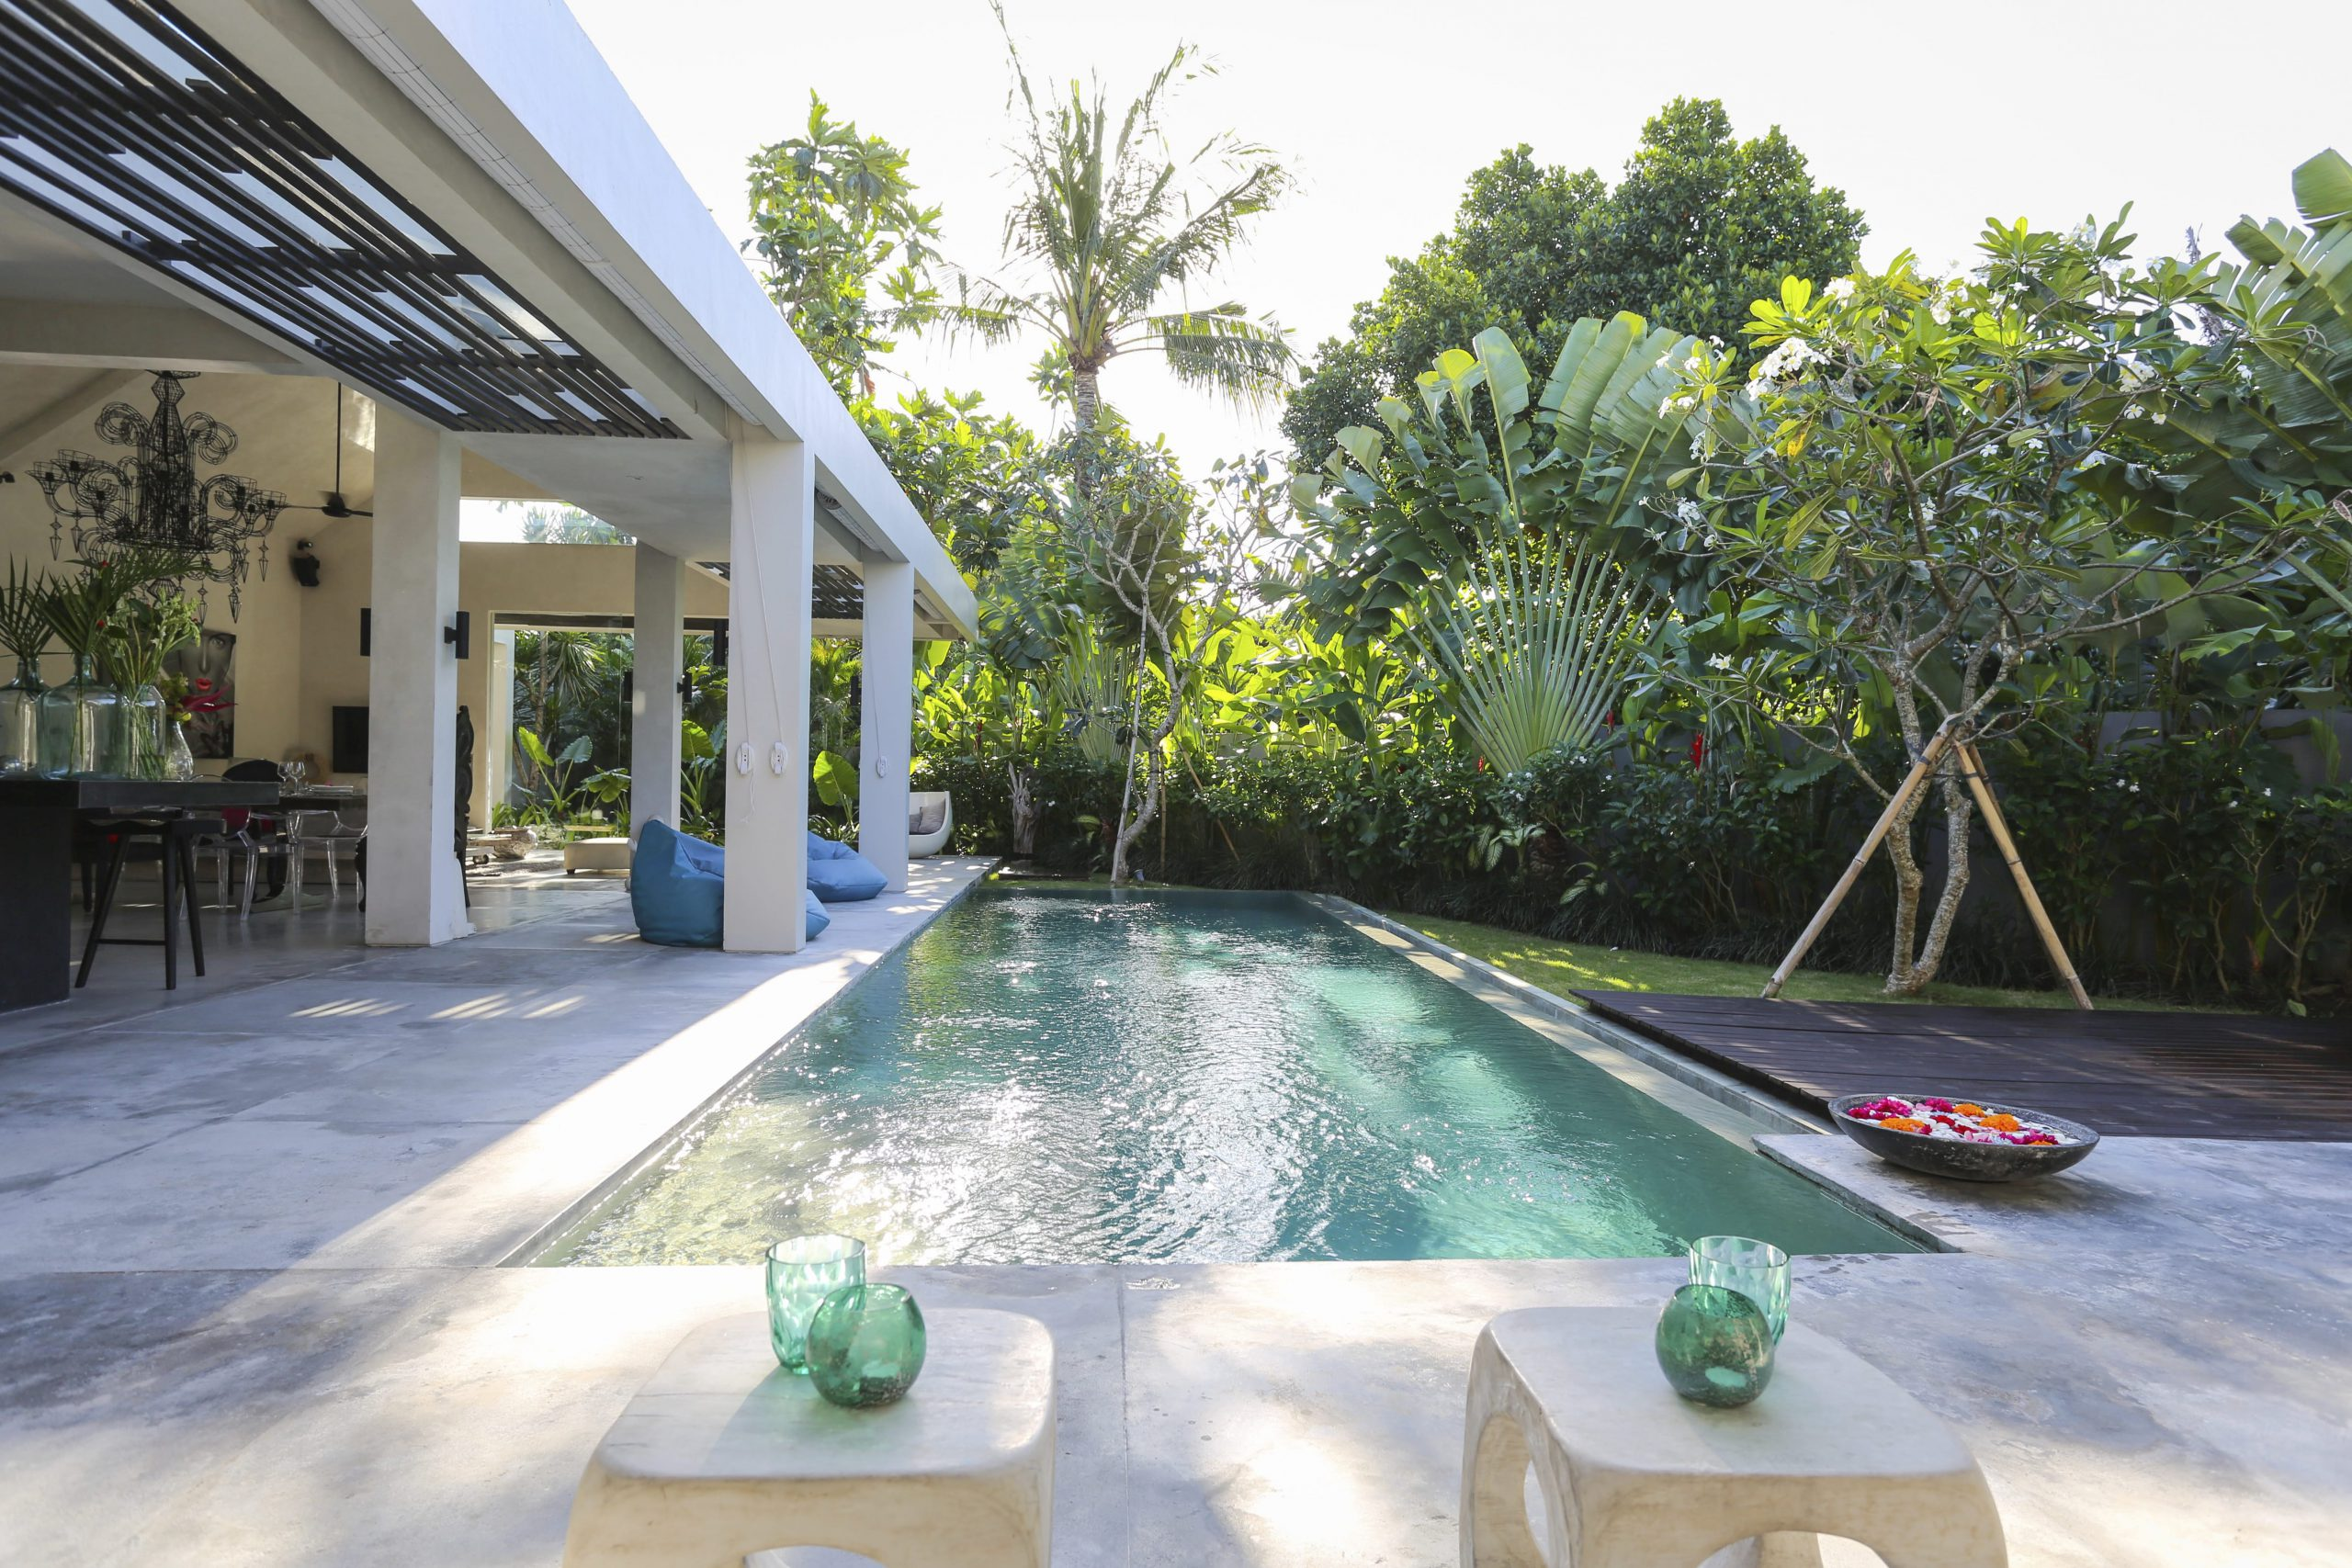 Bali Interior Design, Tina Kirschner Interior Design